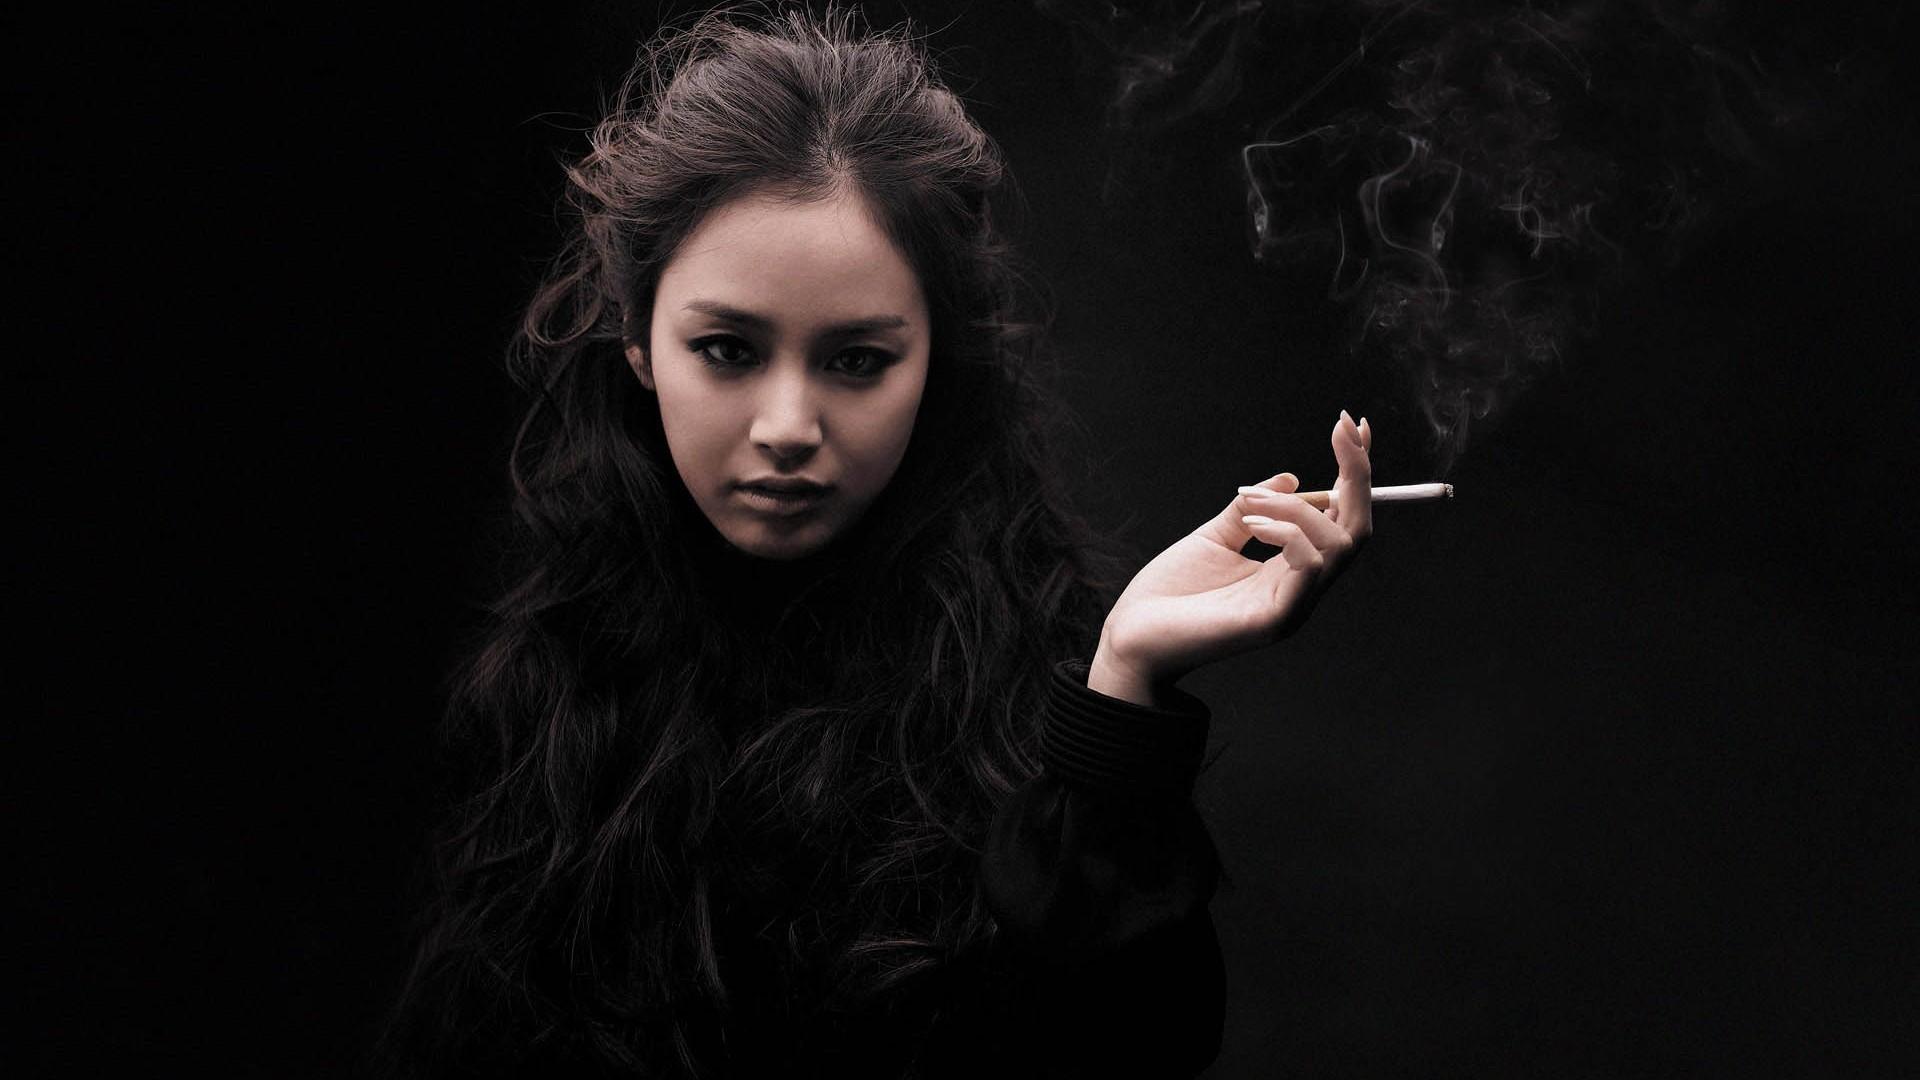 Kim Tae hee Smoking HD Wallpaper